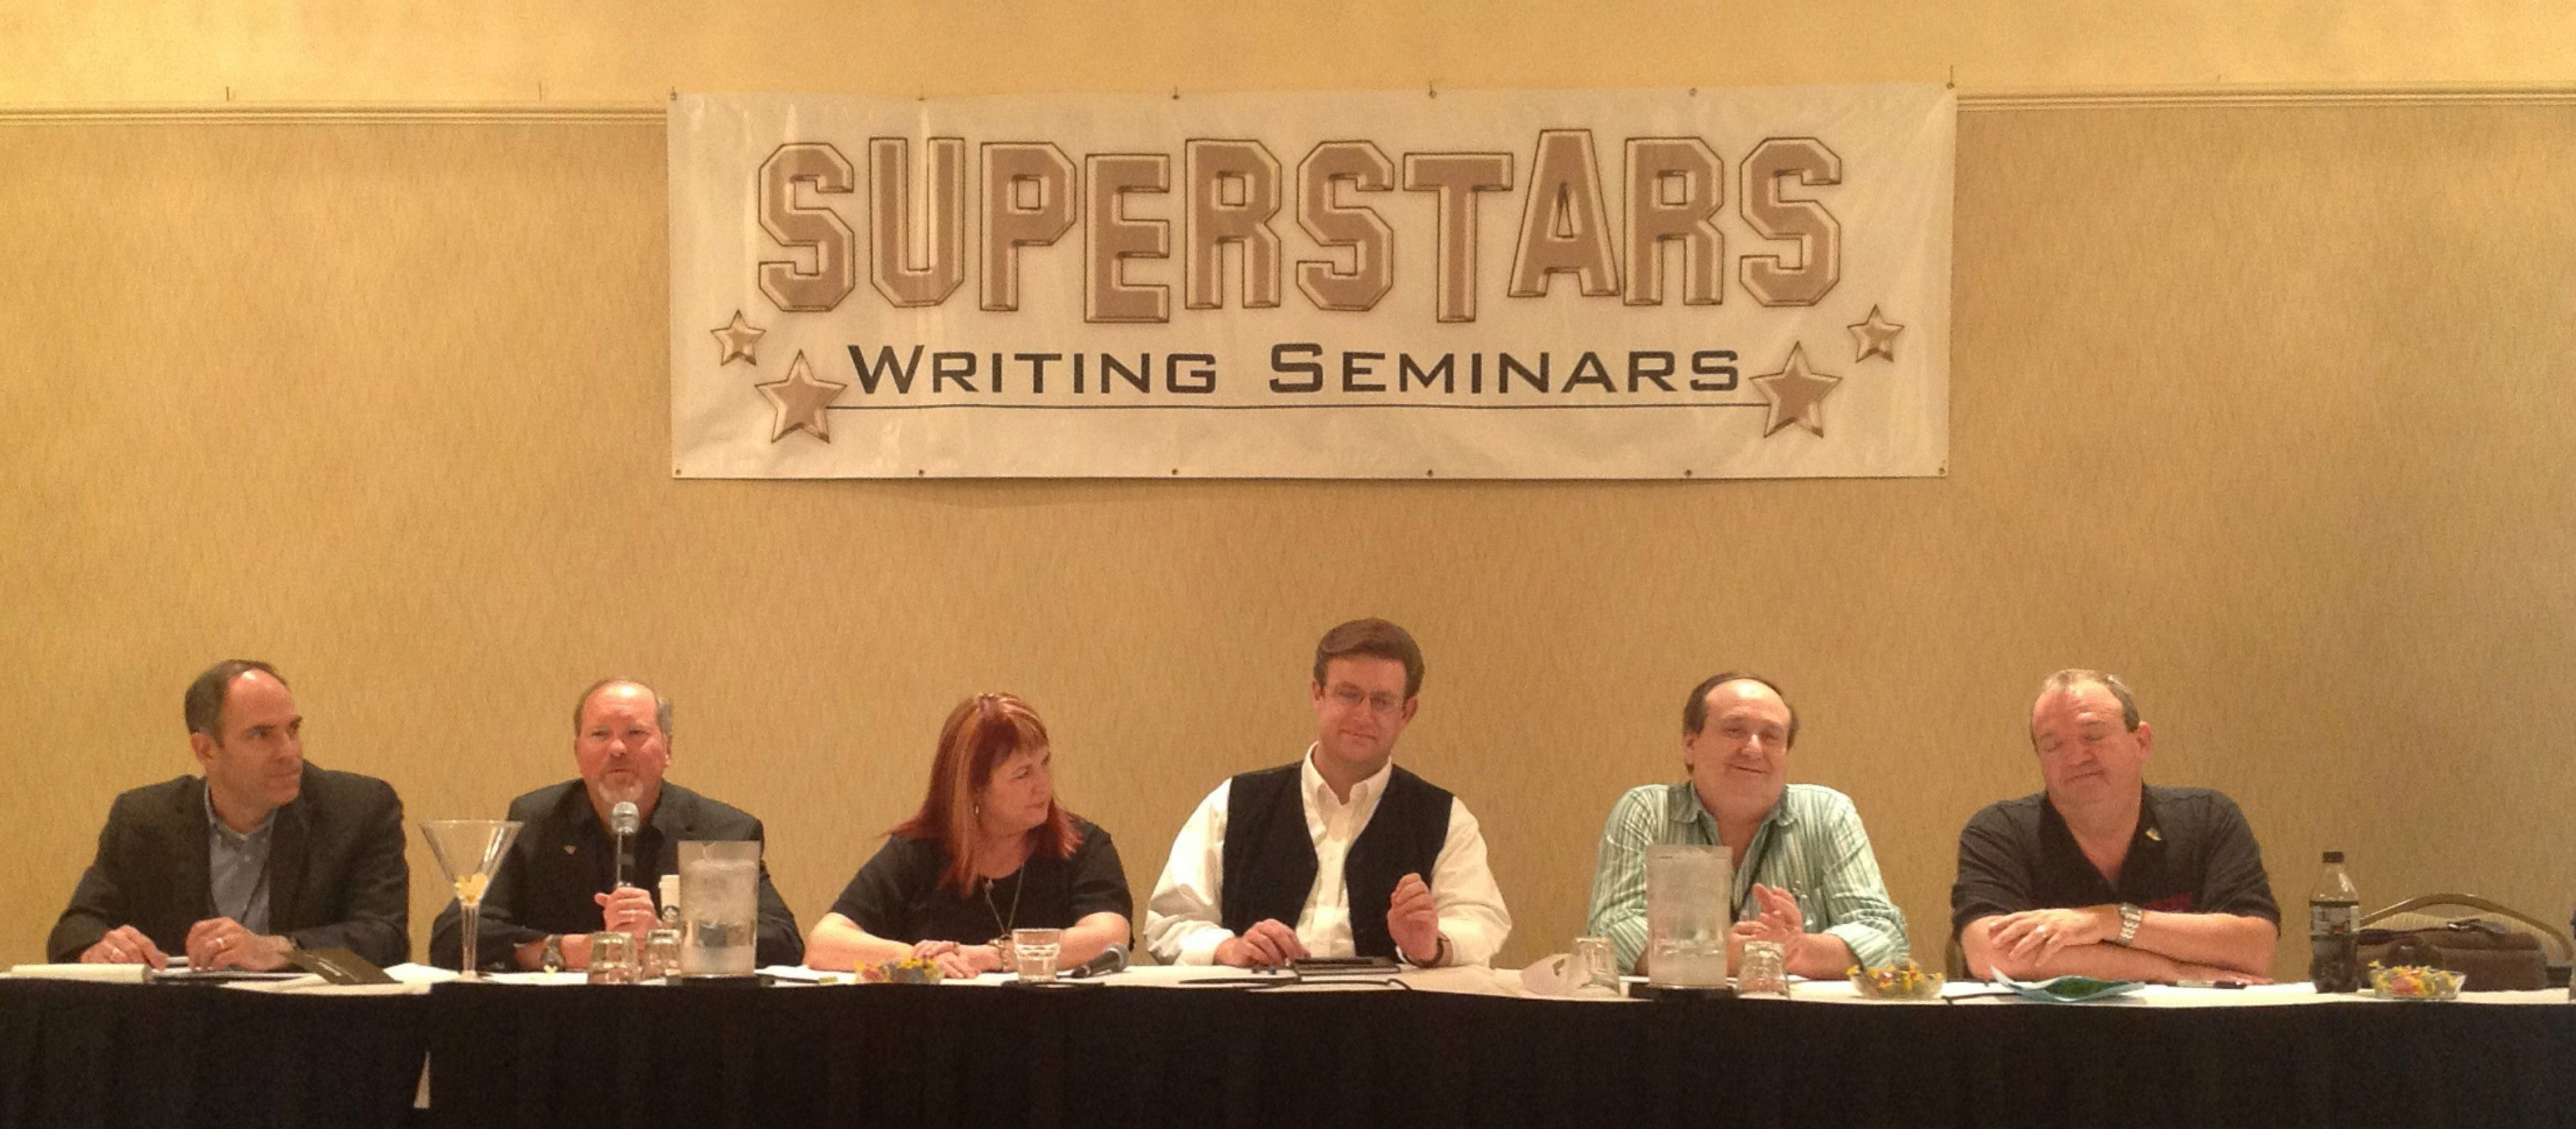 Writing seminar